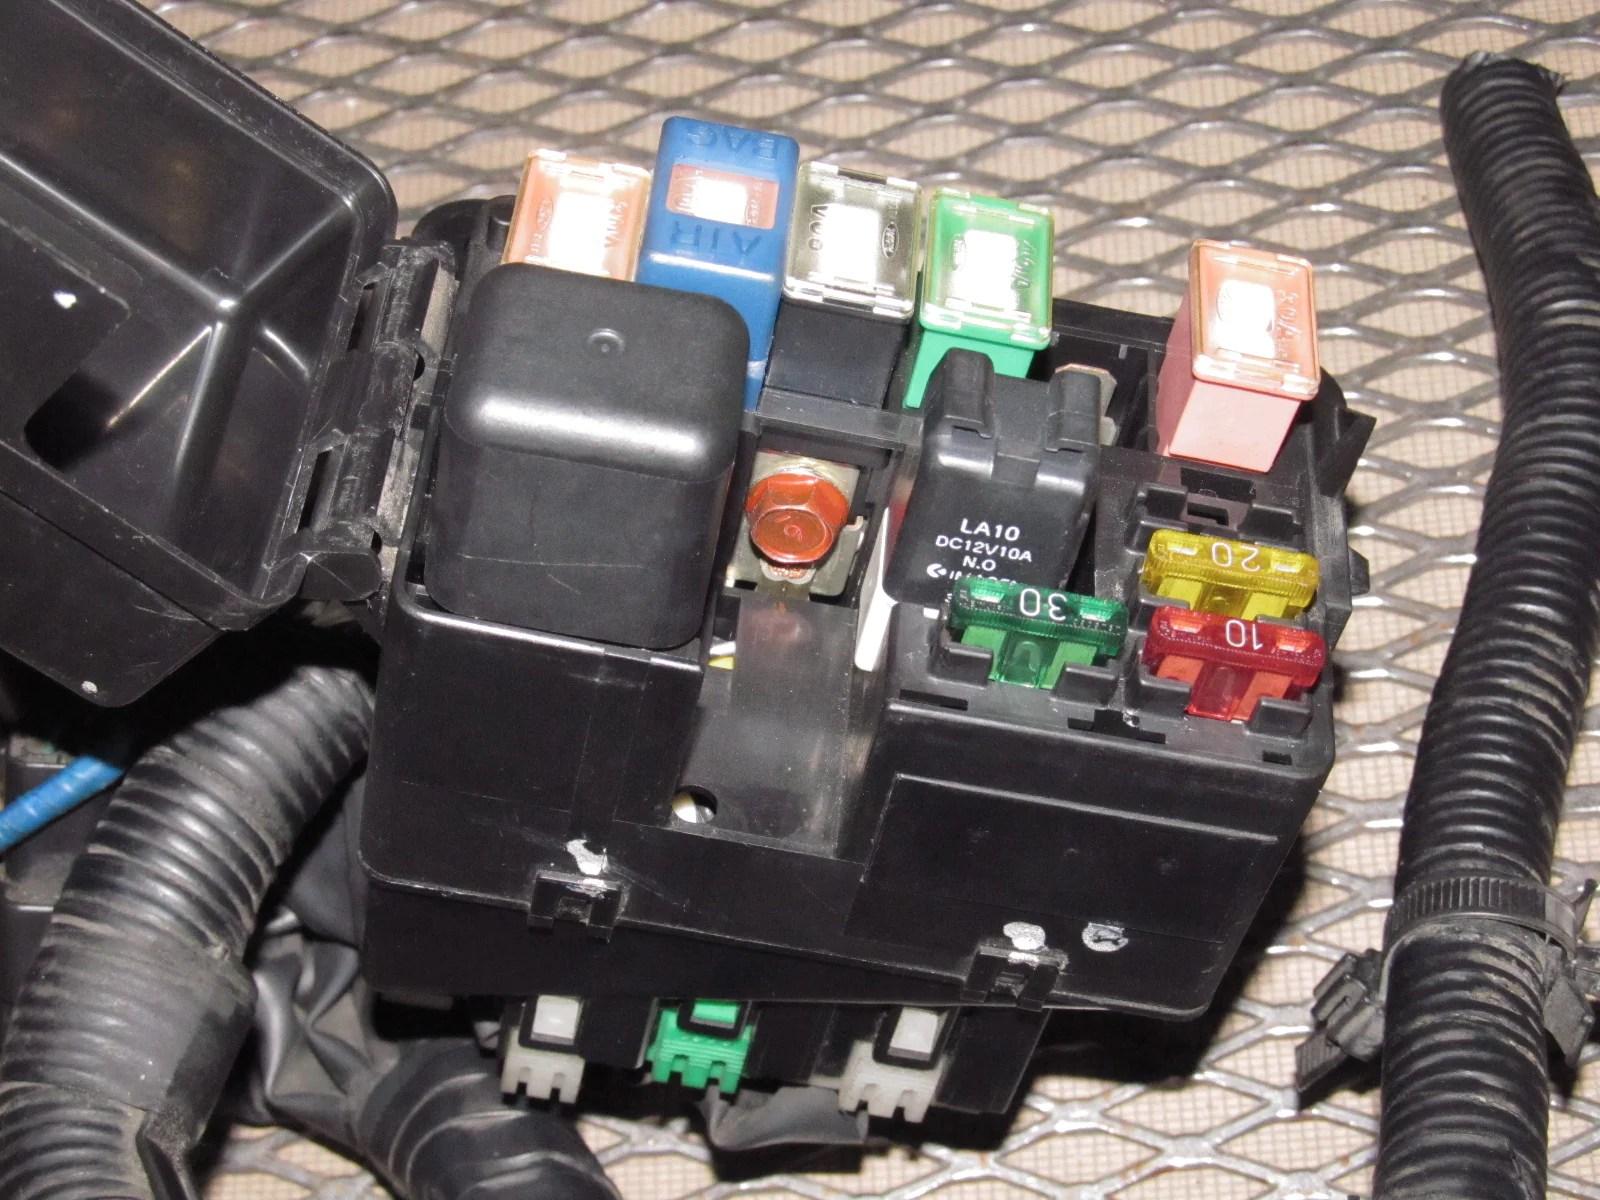 94 95 96 97 mazda miata oem engine fuse box  [ 1600 x 1200 Pixel ]